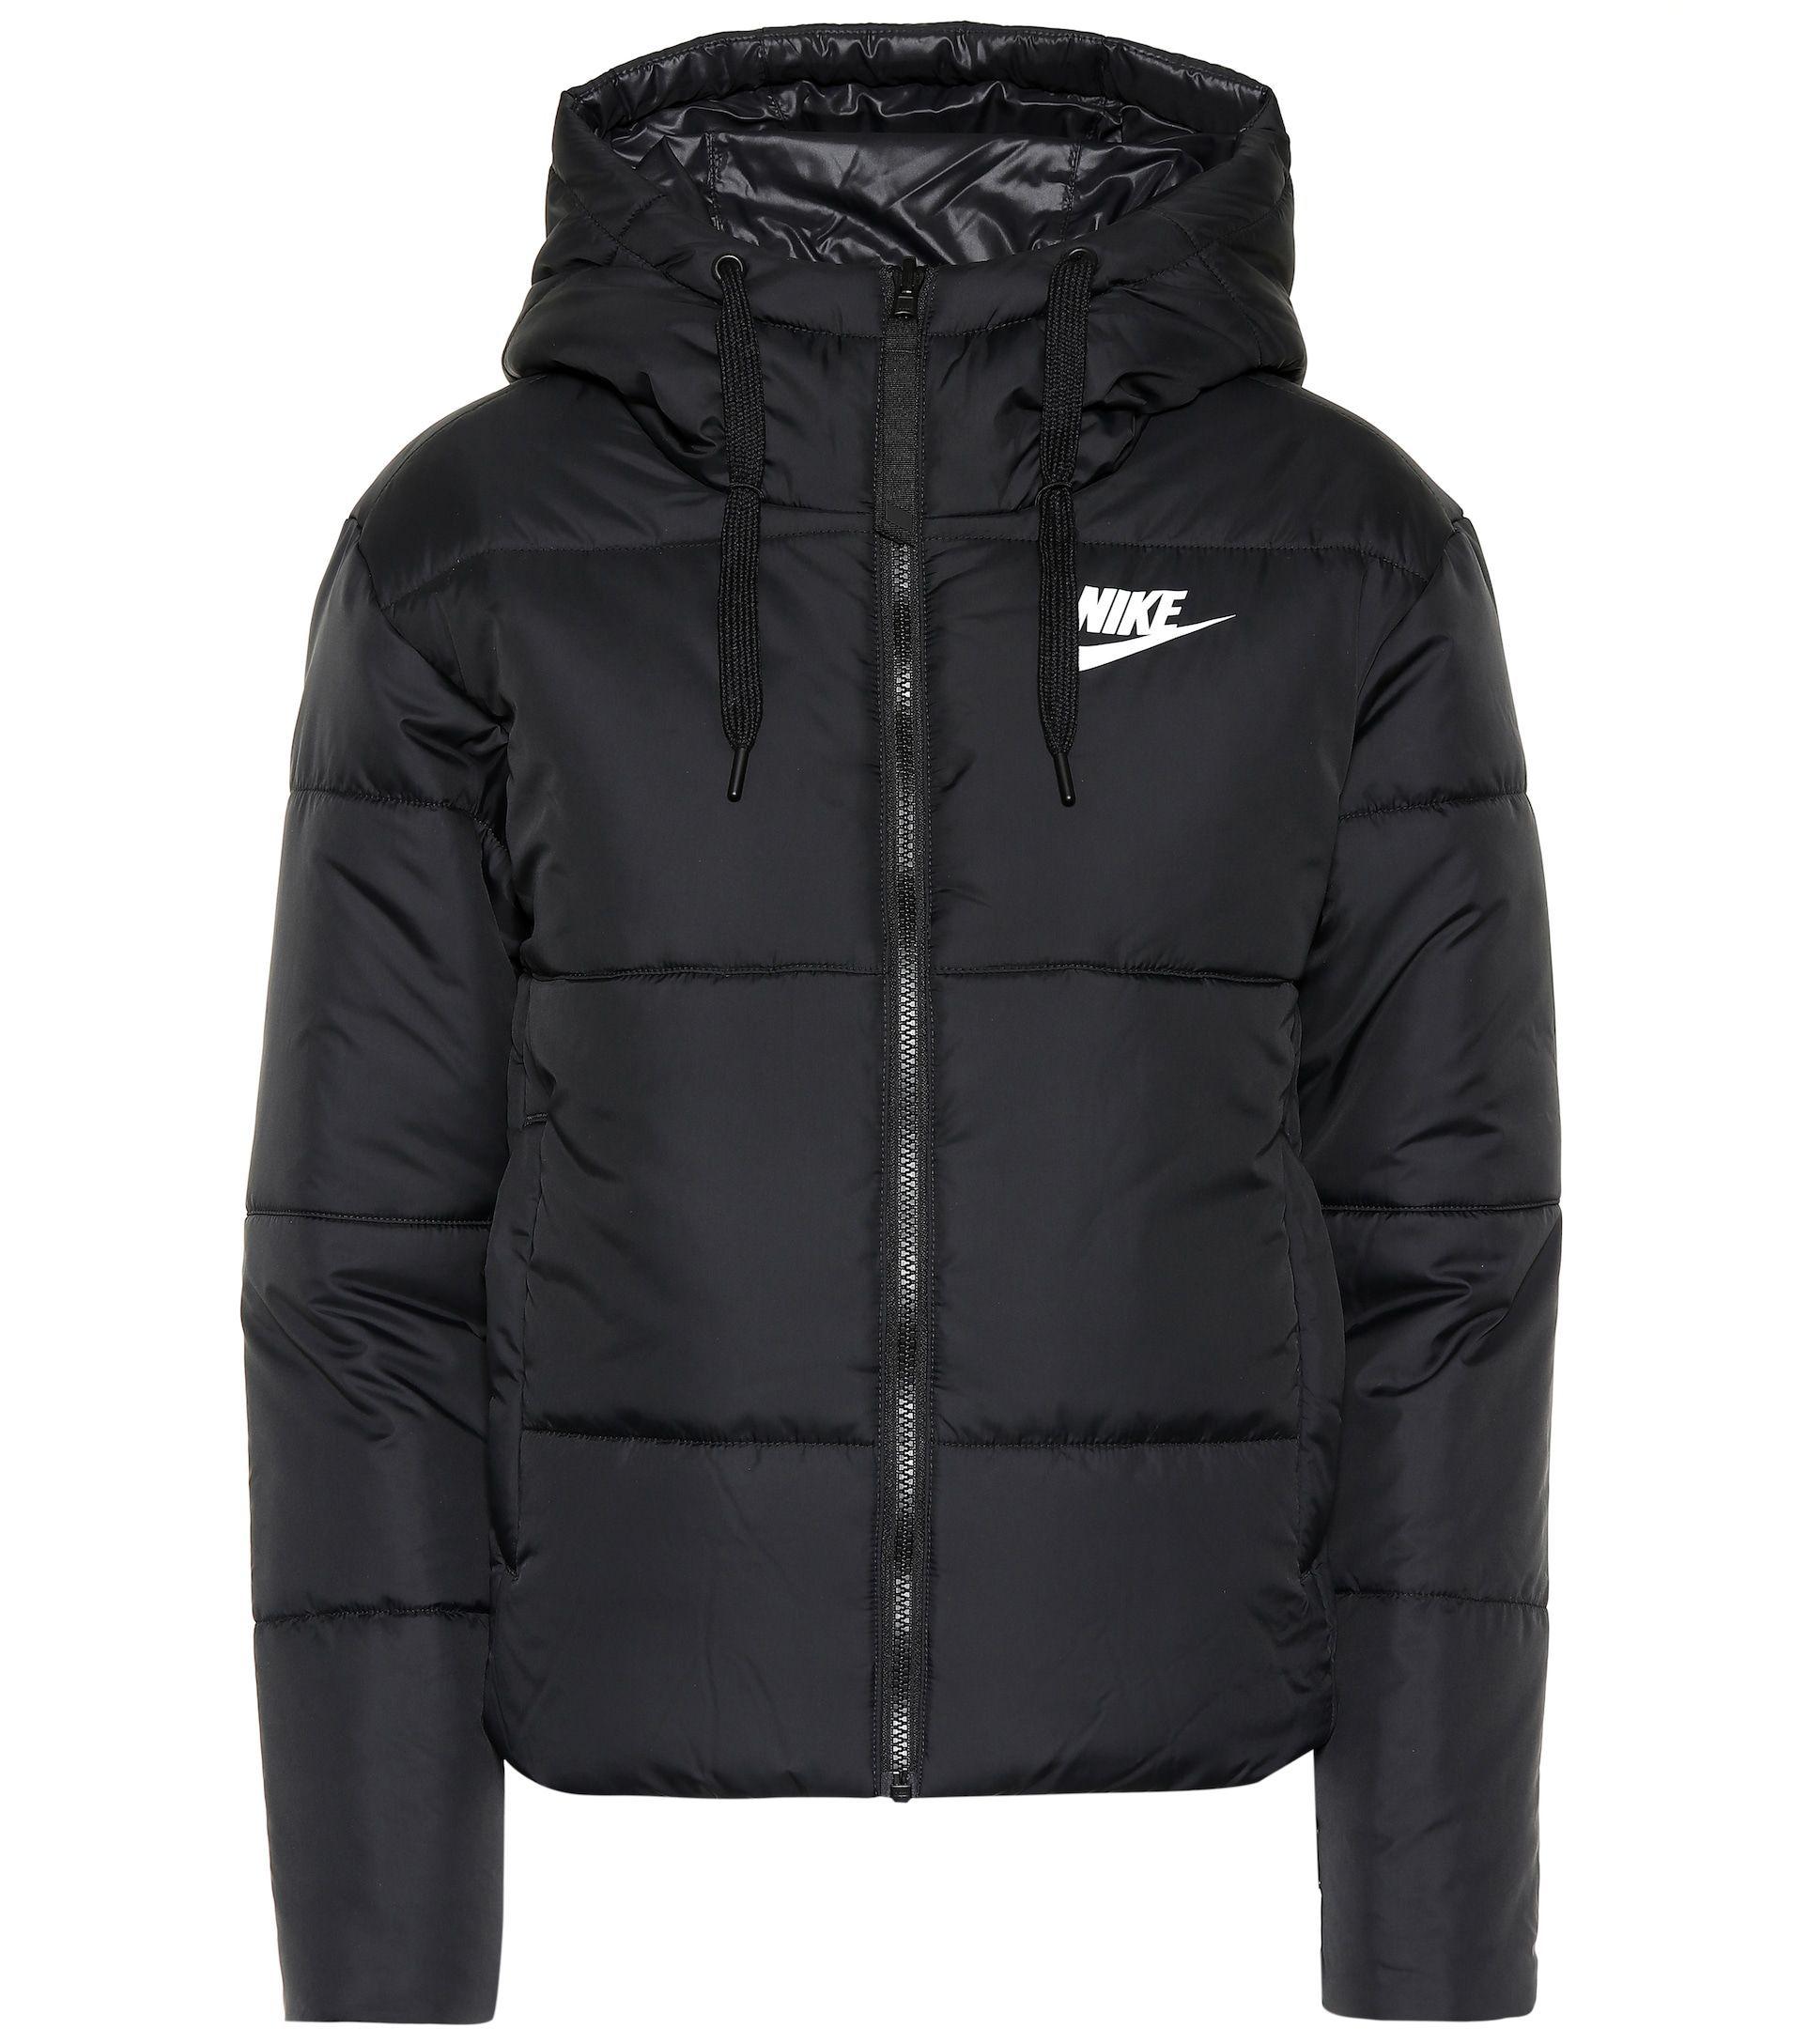 Activo hacerte molestar Cien años  Reversible Hooded Jacket - Nike | mytheresa.com | Ropa nike, Ropa deportiva  nike, Chaqueta nike